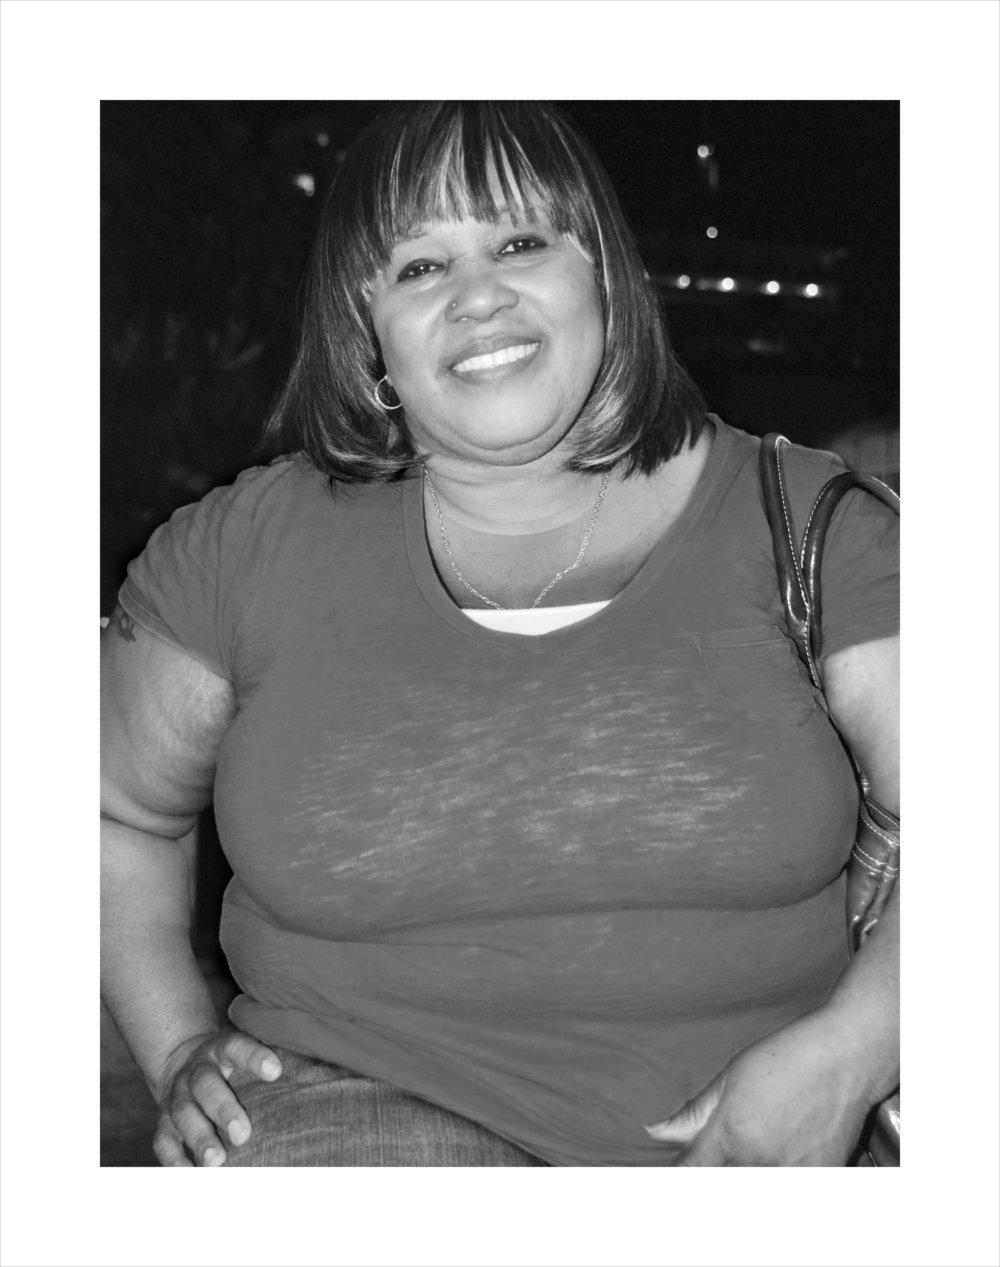 Karlene from Jamaica DSC_7580flat copy.JPG